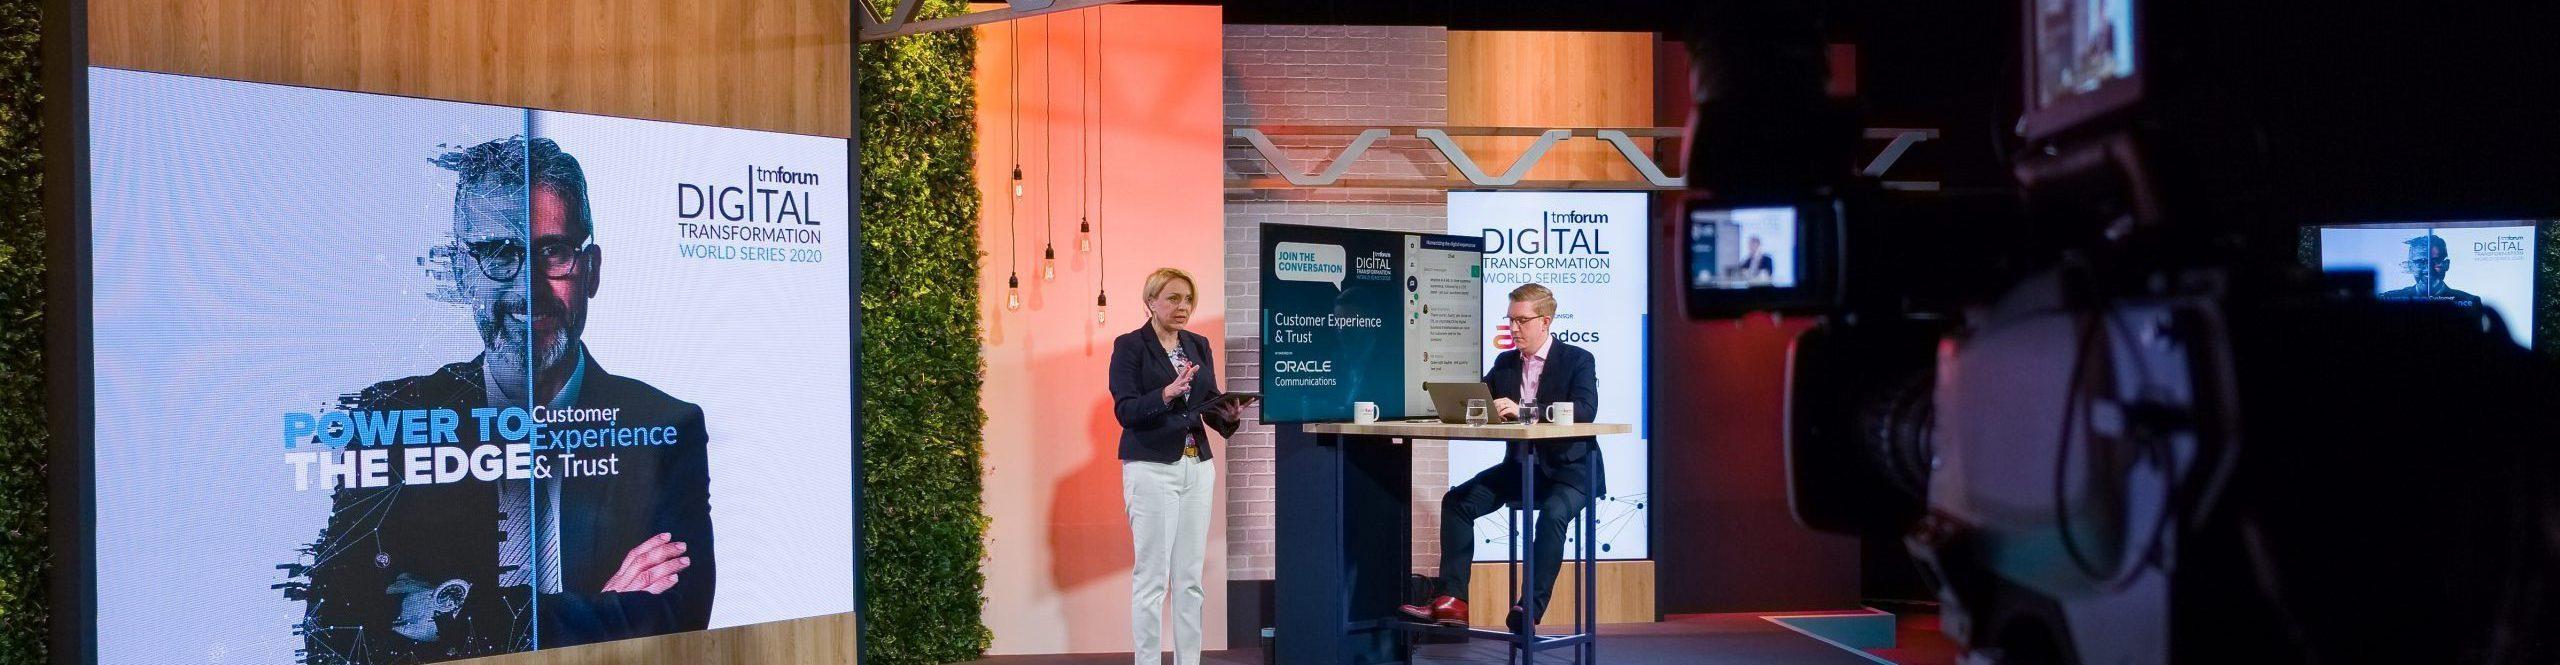 TM Forum's virtual conference